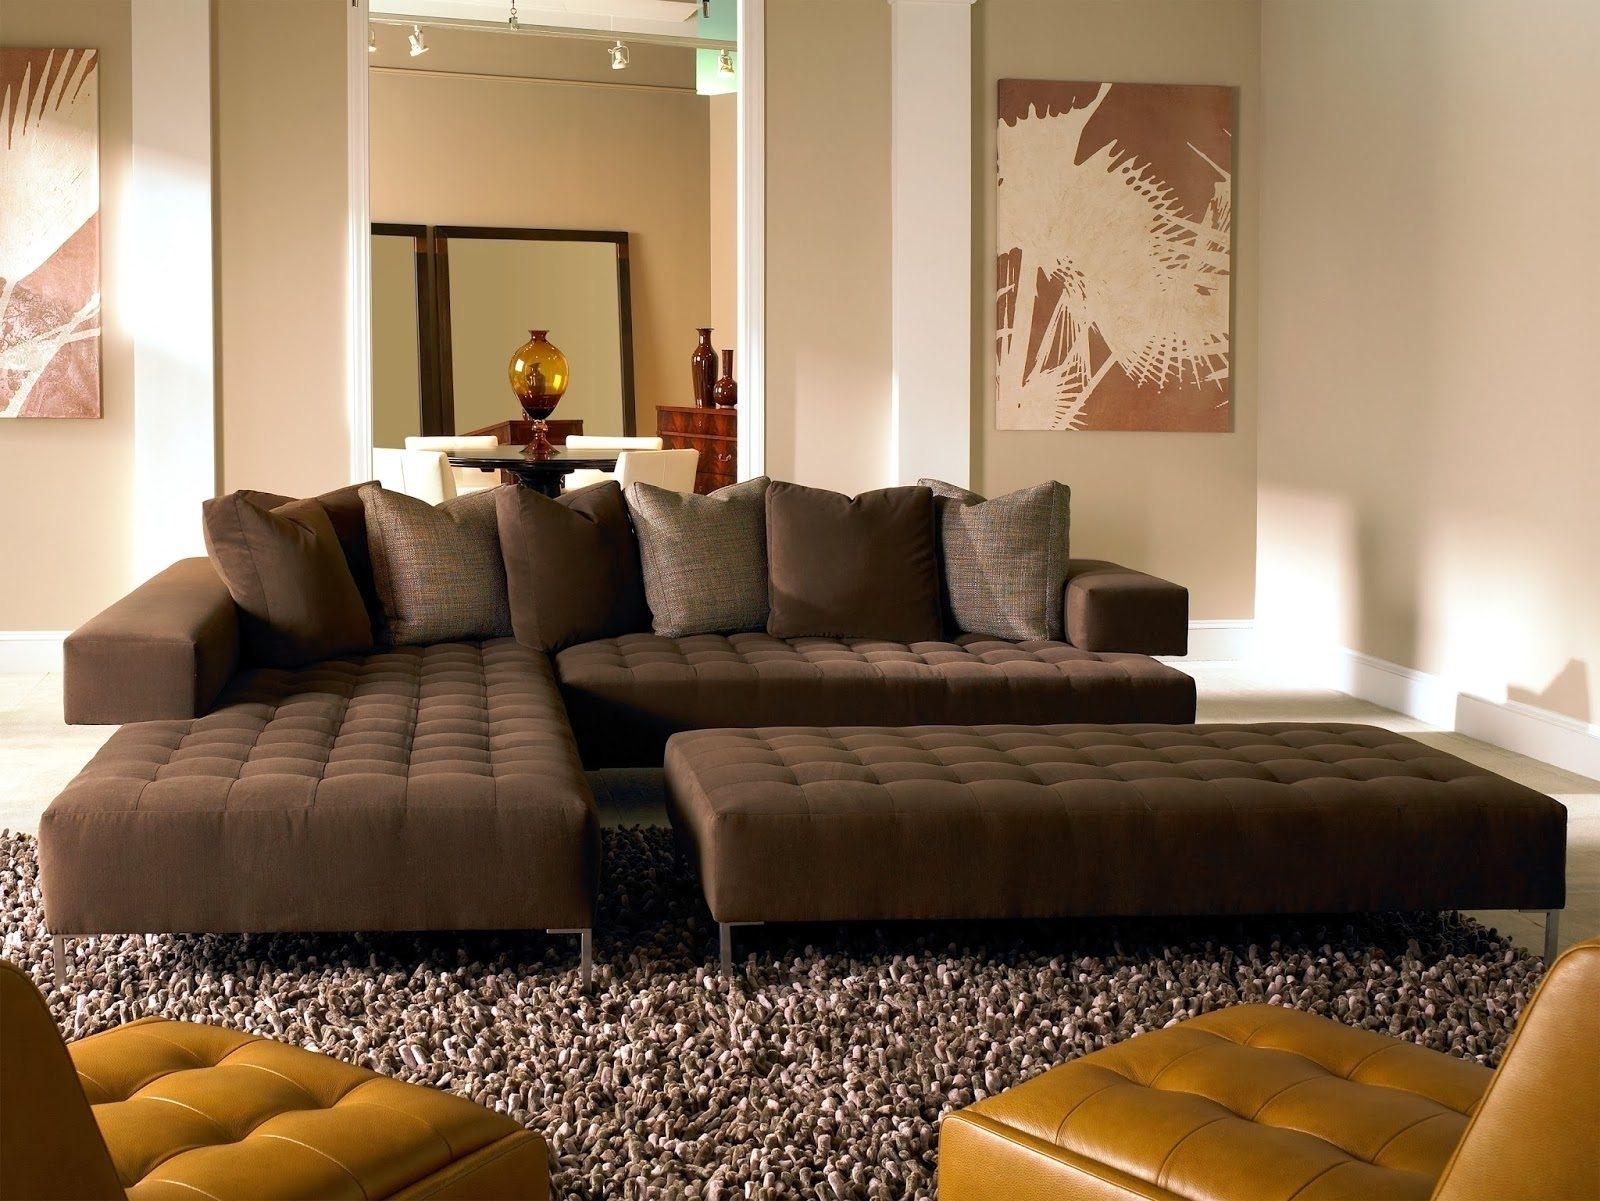 Craigslist Sleeper Sofa Hereo Sofa Intended For Craigslist Sleeper Sofa (Image 6 of 15)